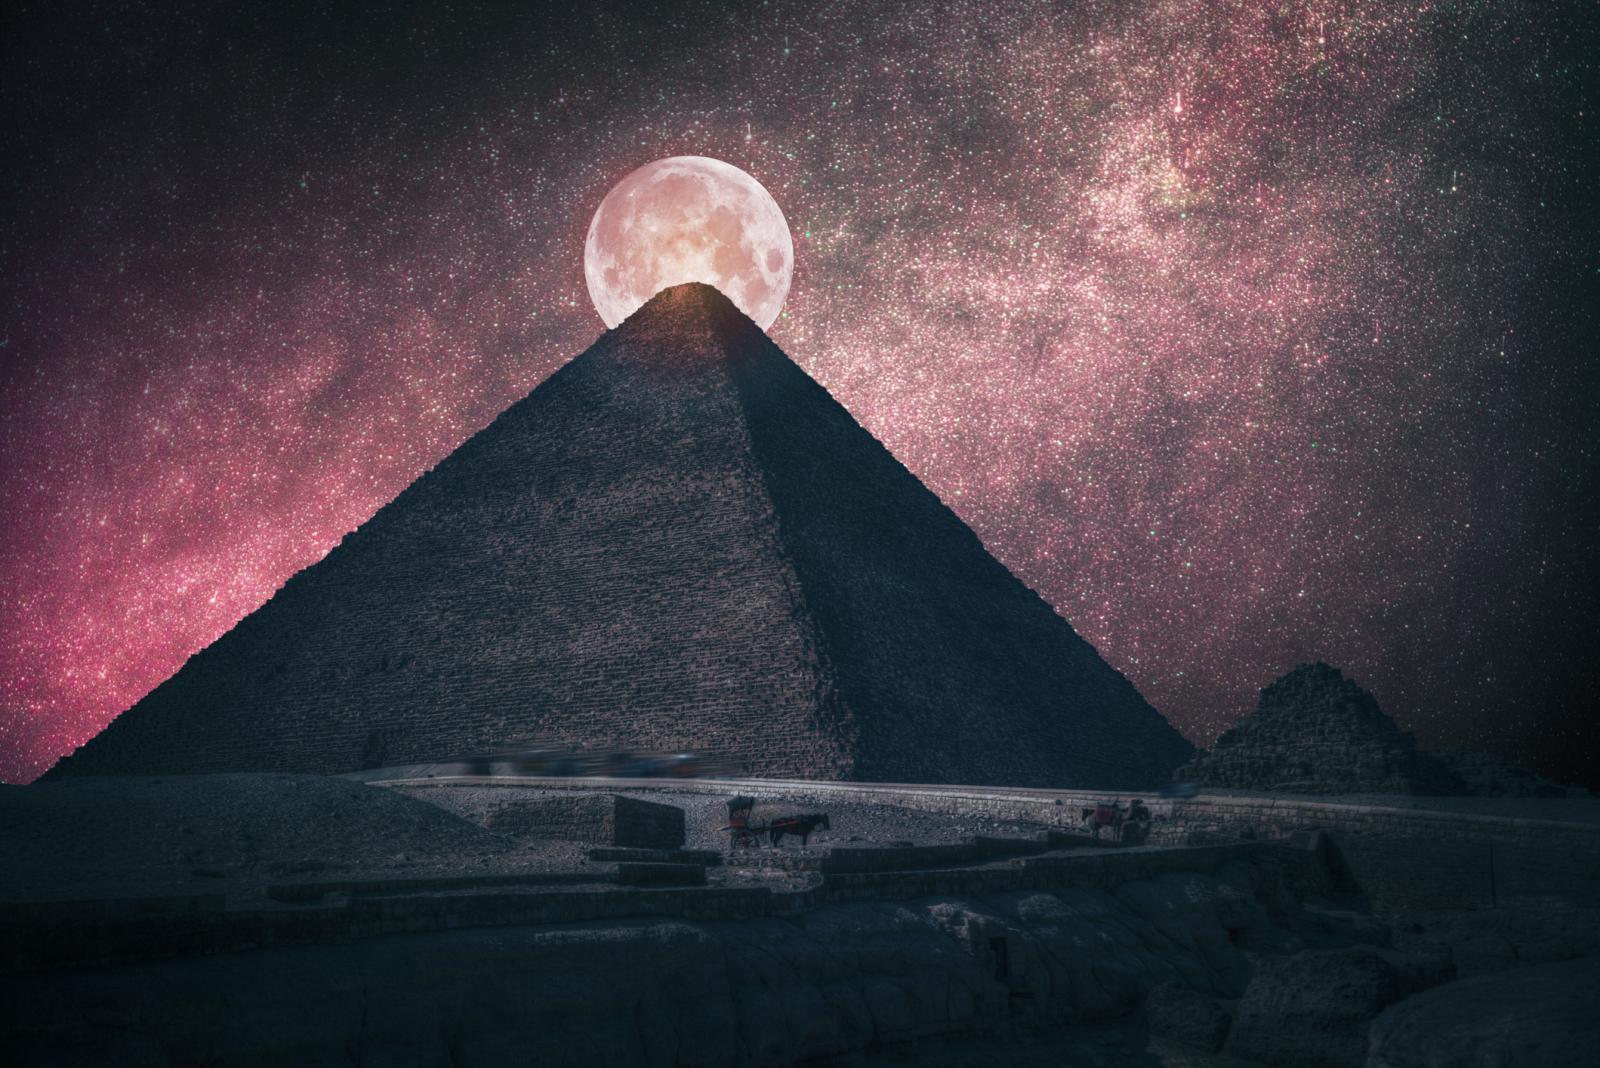 Pyramids of Egypt at night